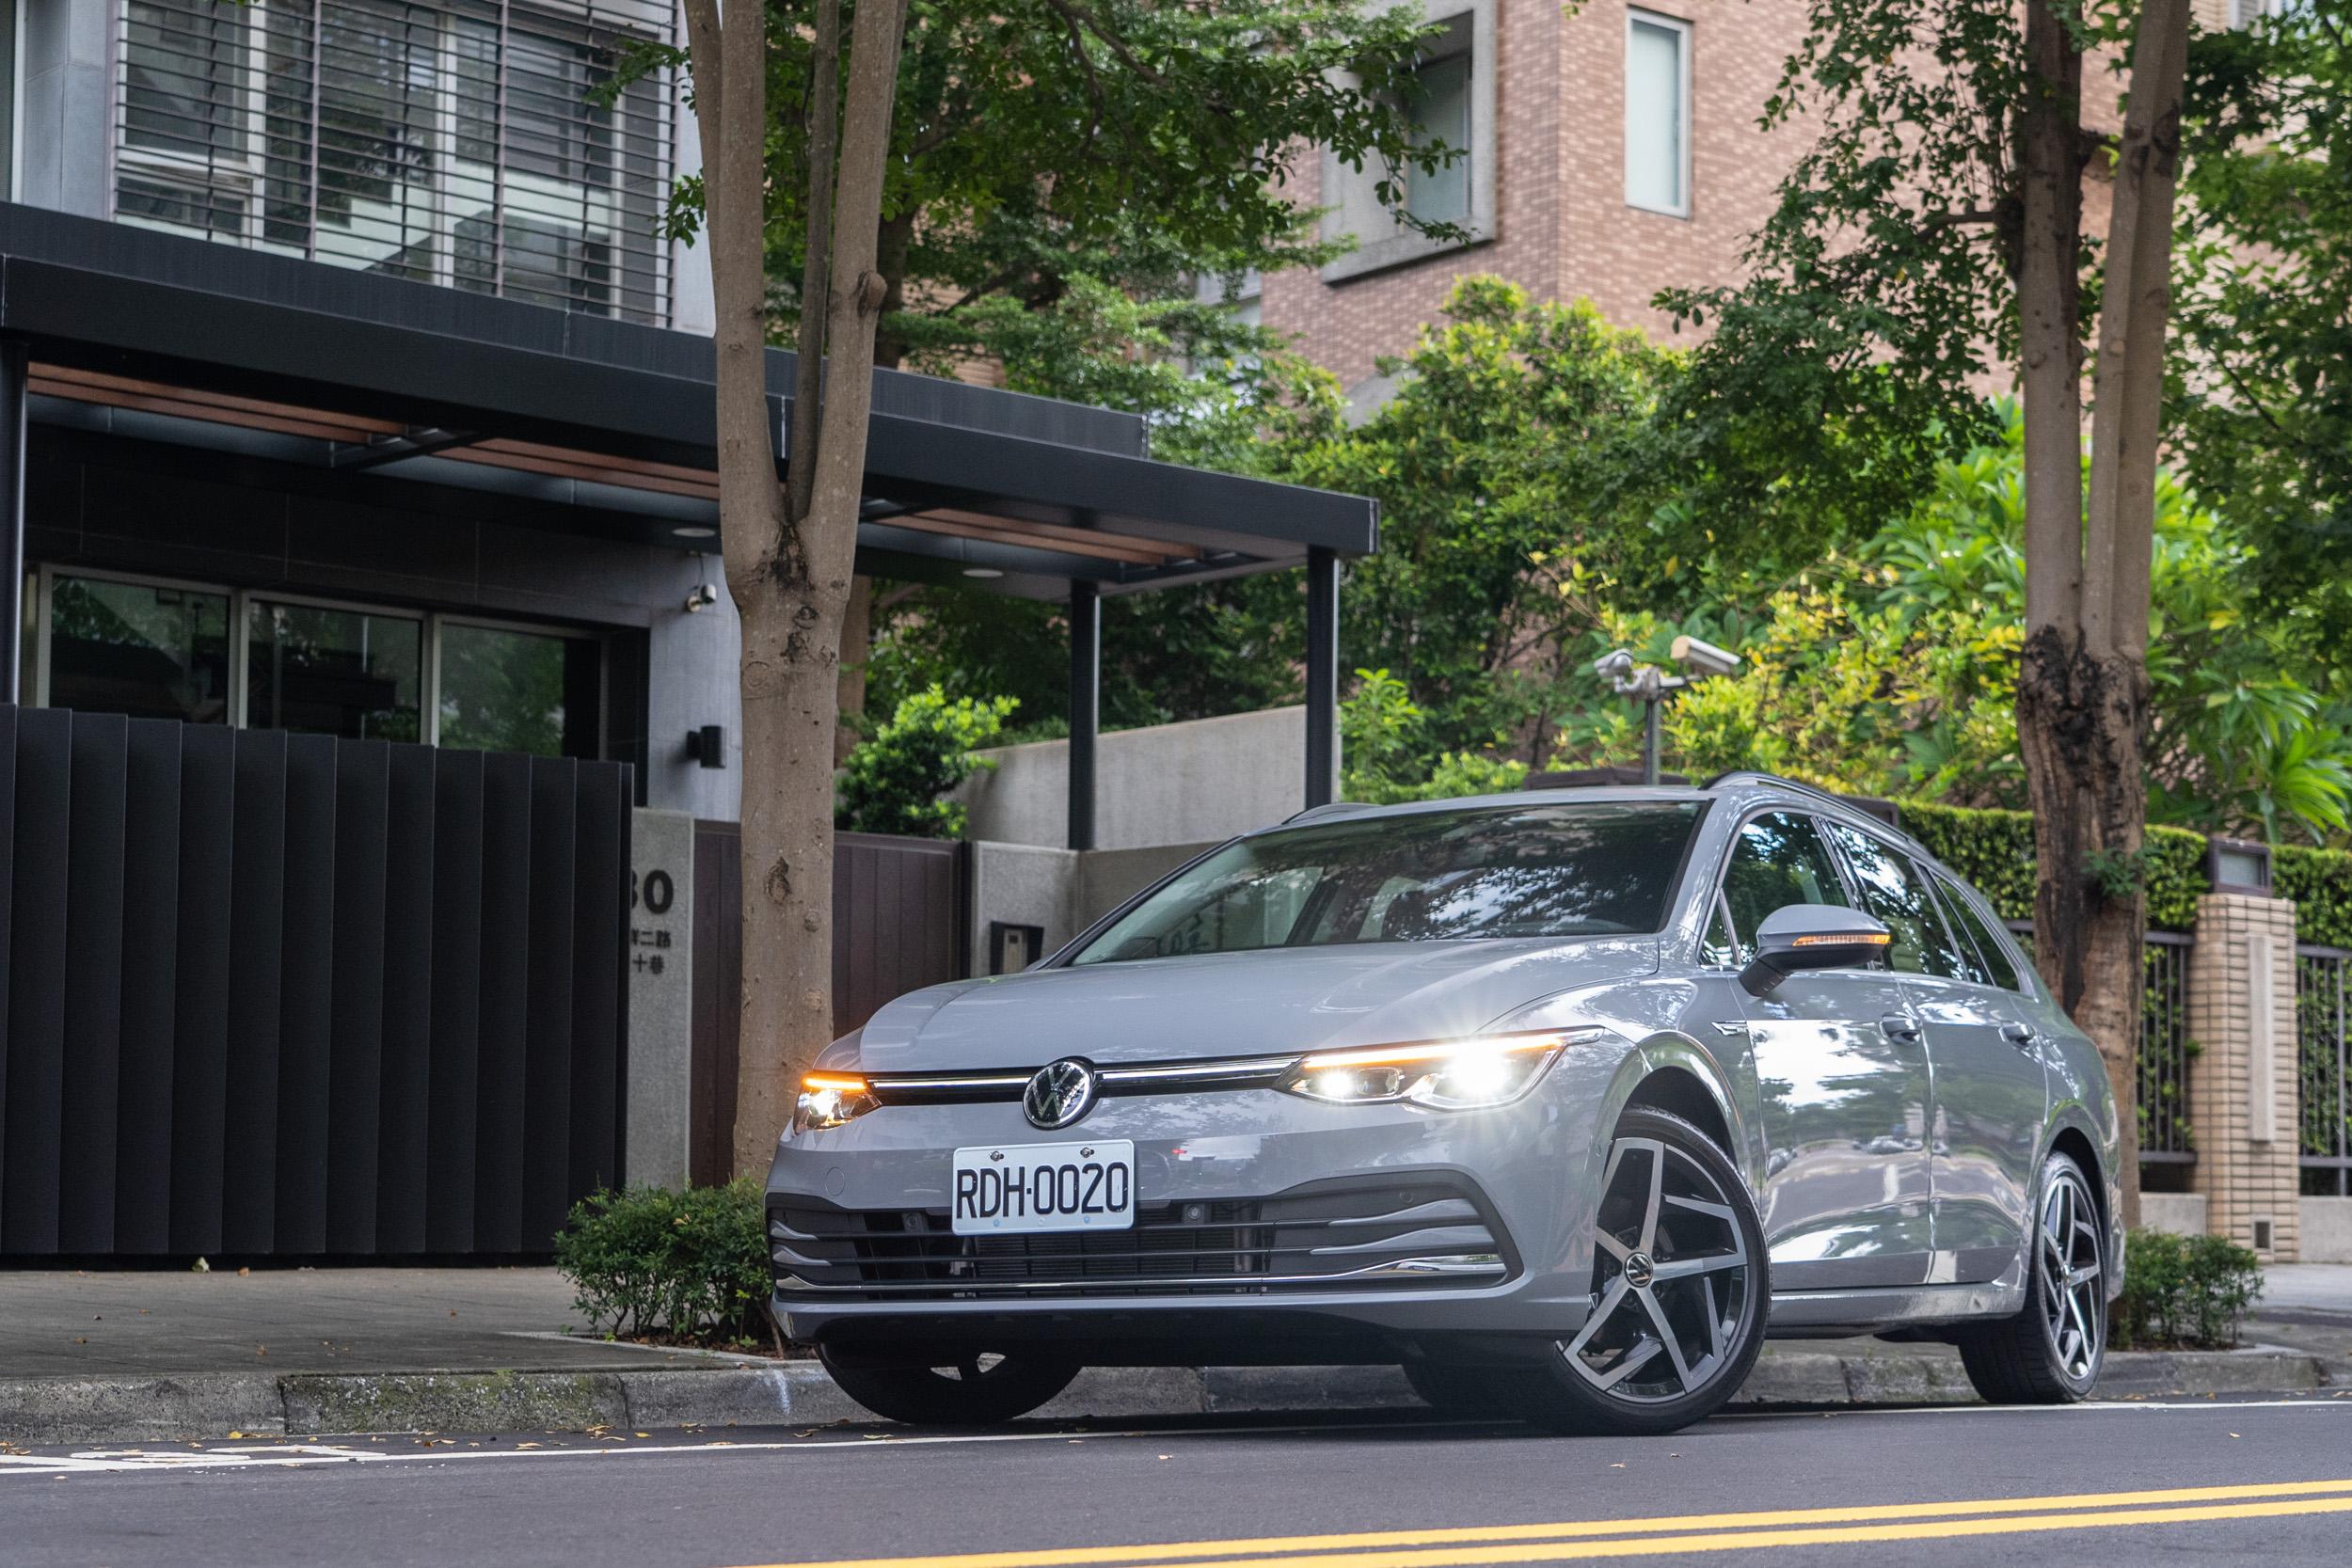 試駕車款為Volkswagen Golf Variant  280 eTSI Style,售價為新台幣 121.8 萬元。